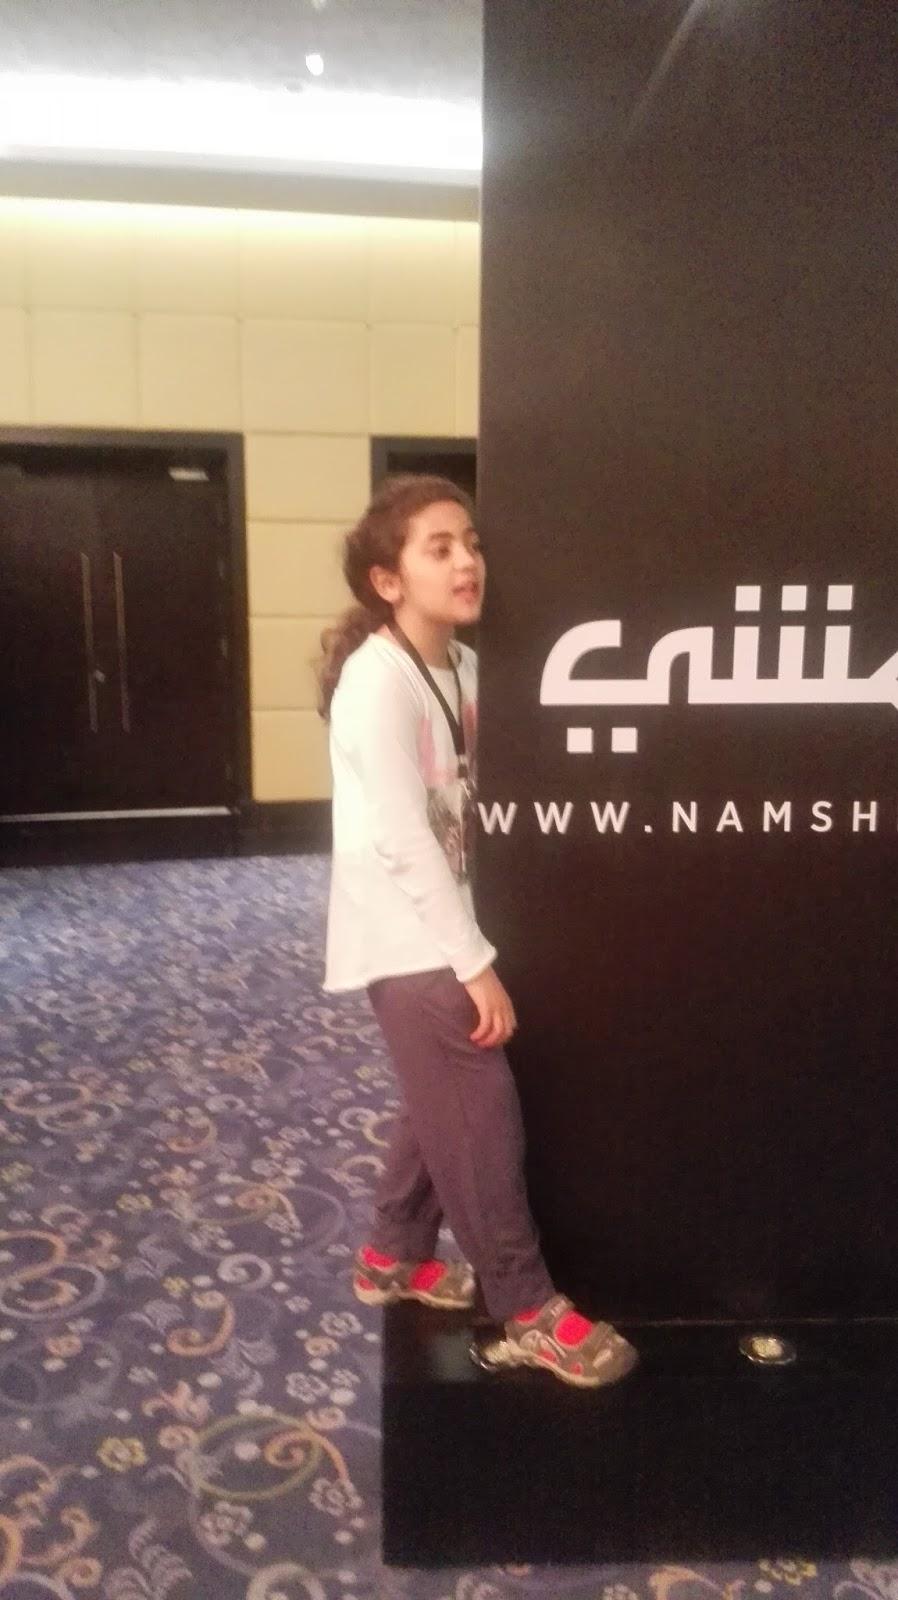 c39a3a9df NAMSHI نمشي للازياء والموضه للتسوق عبر الانترنت - Araby Mall   مول العرب